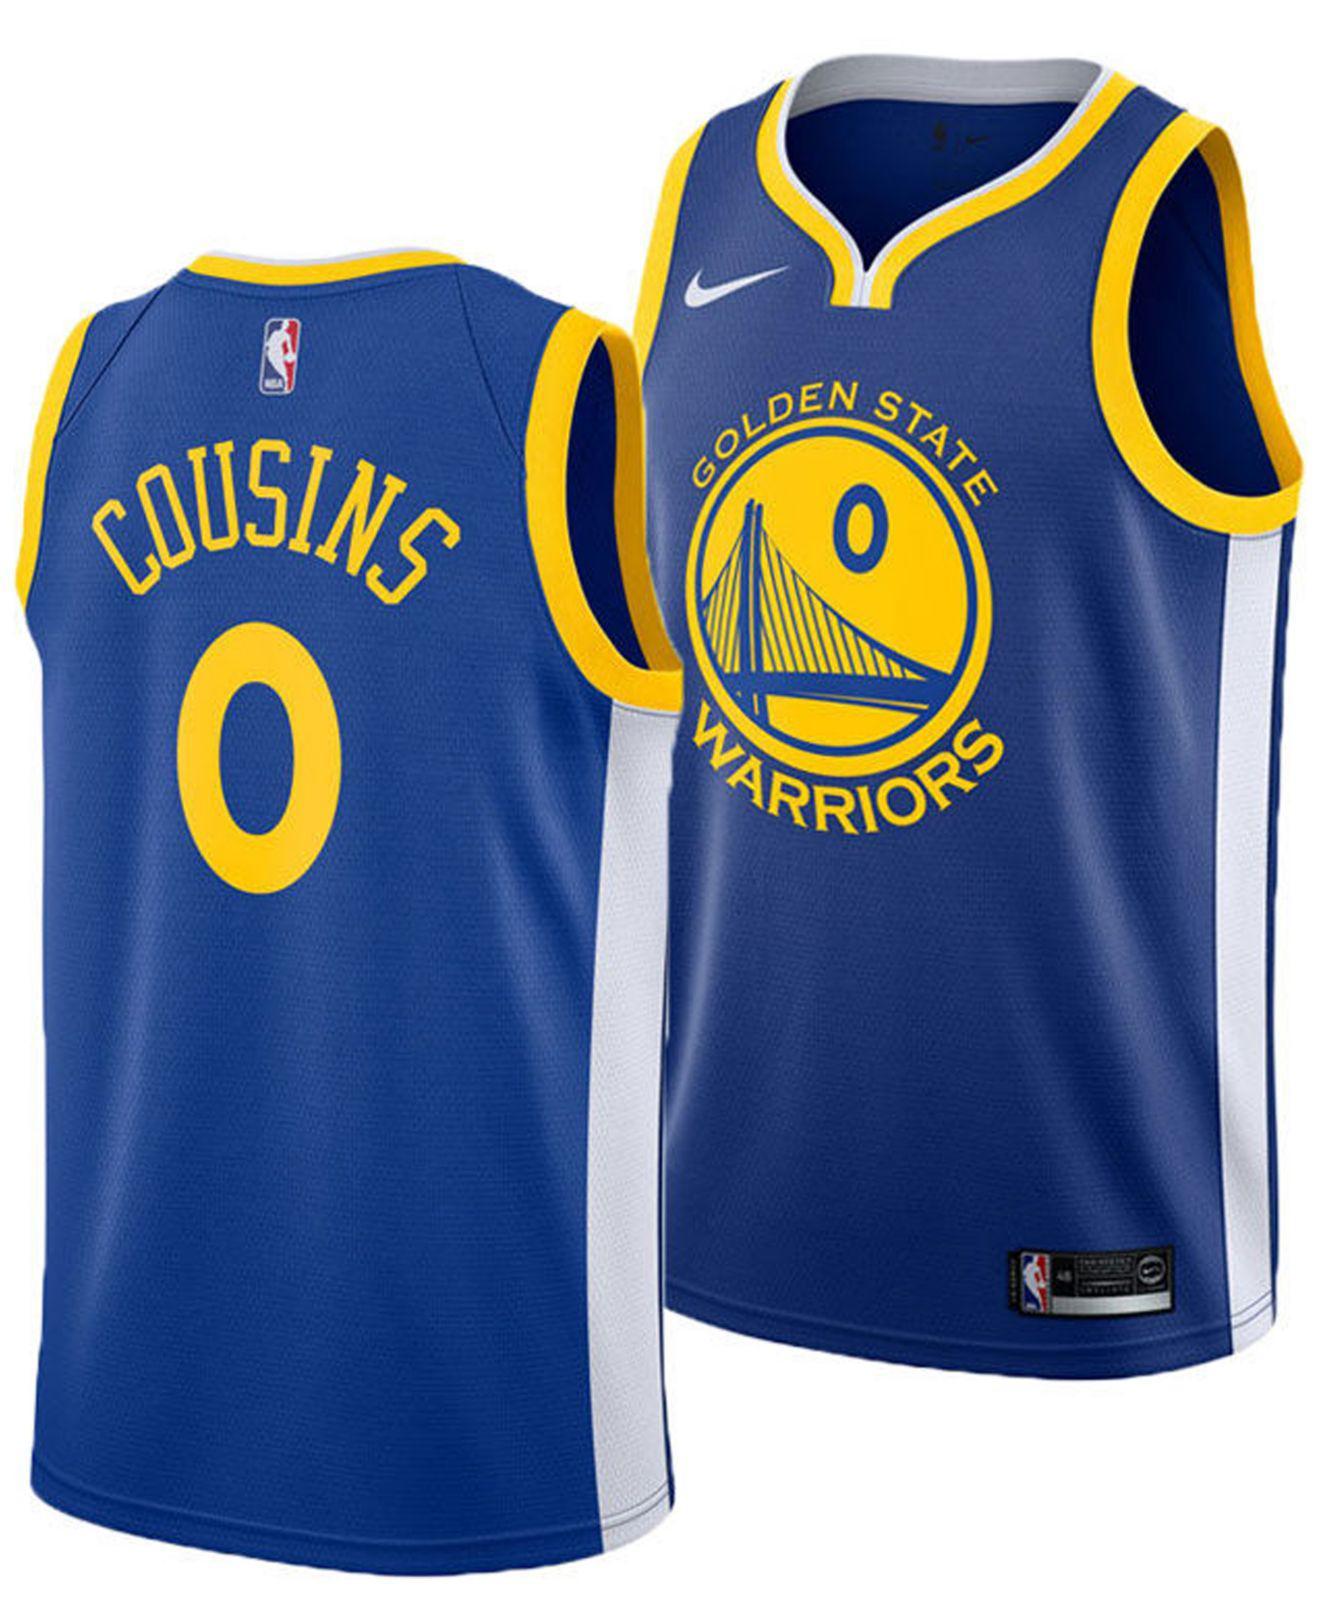 161c719e87577e Lyst - Nike Demarcus Cousins Golden State Warriors Icon Swingman ...